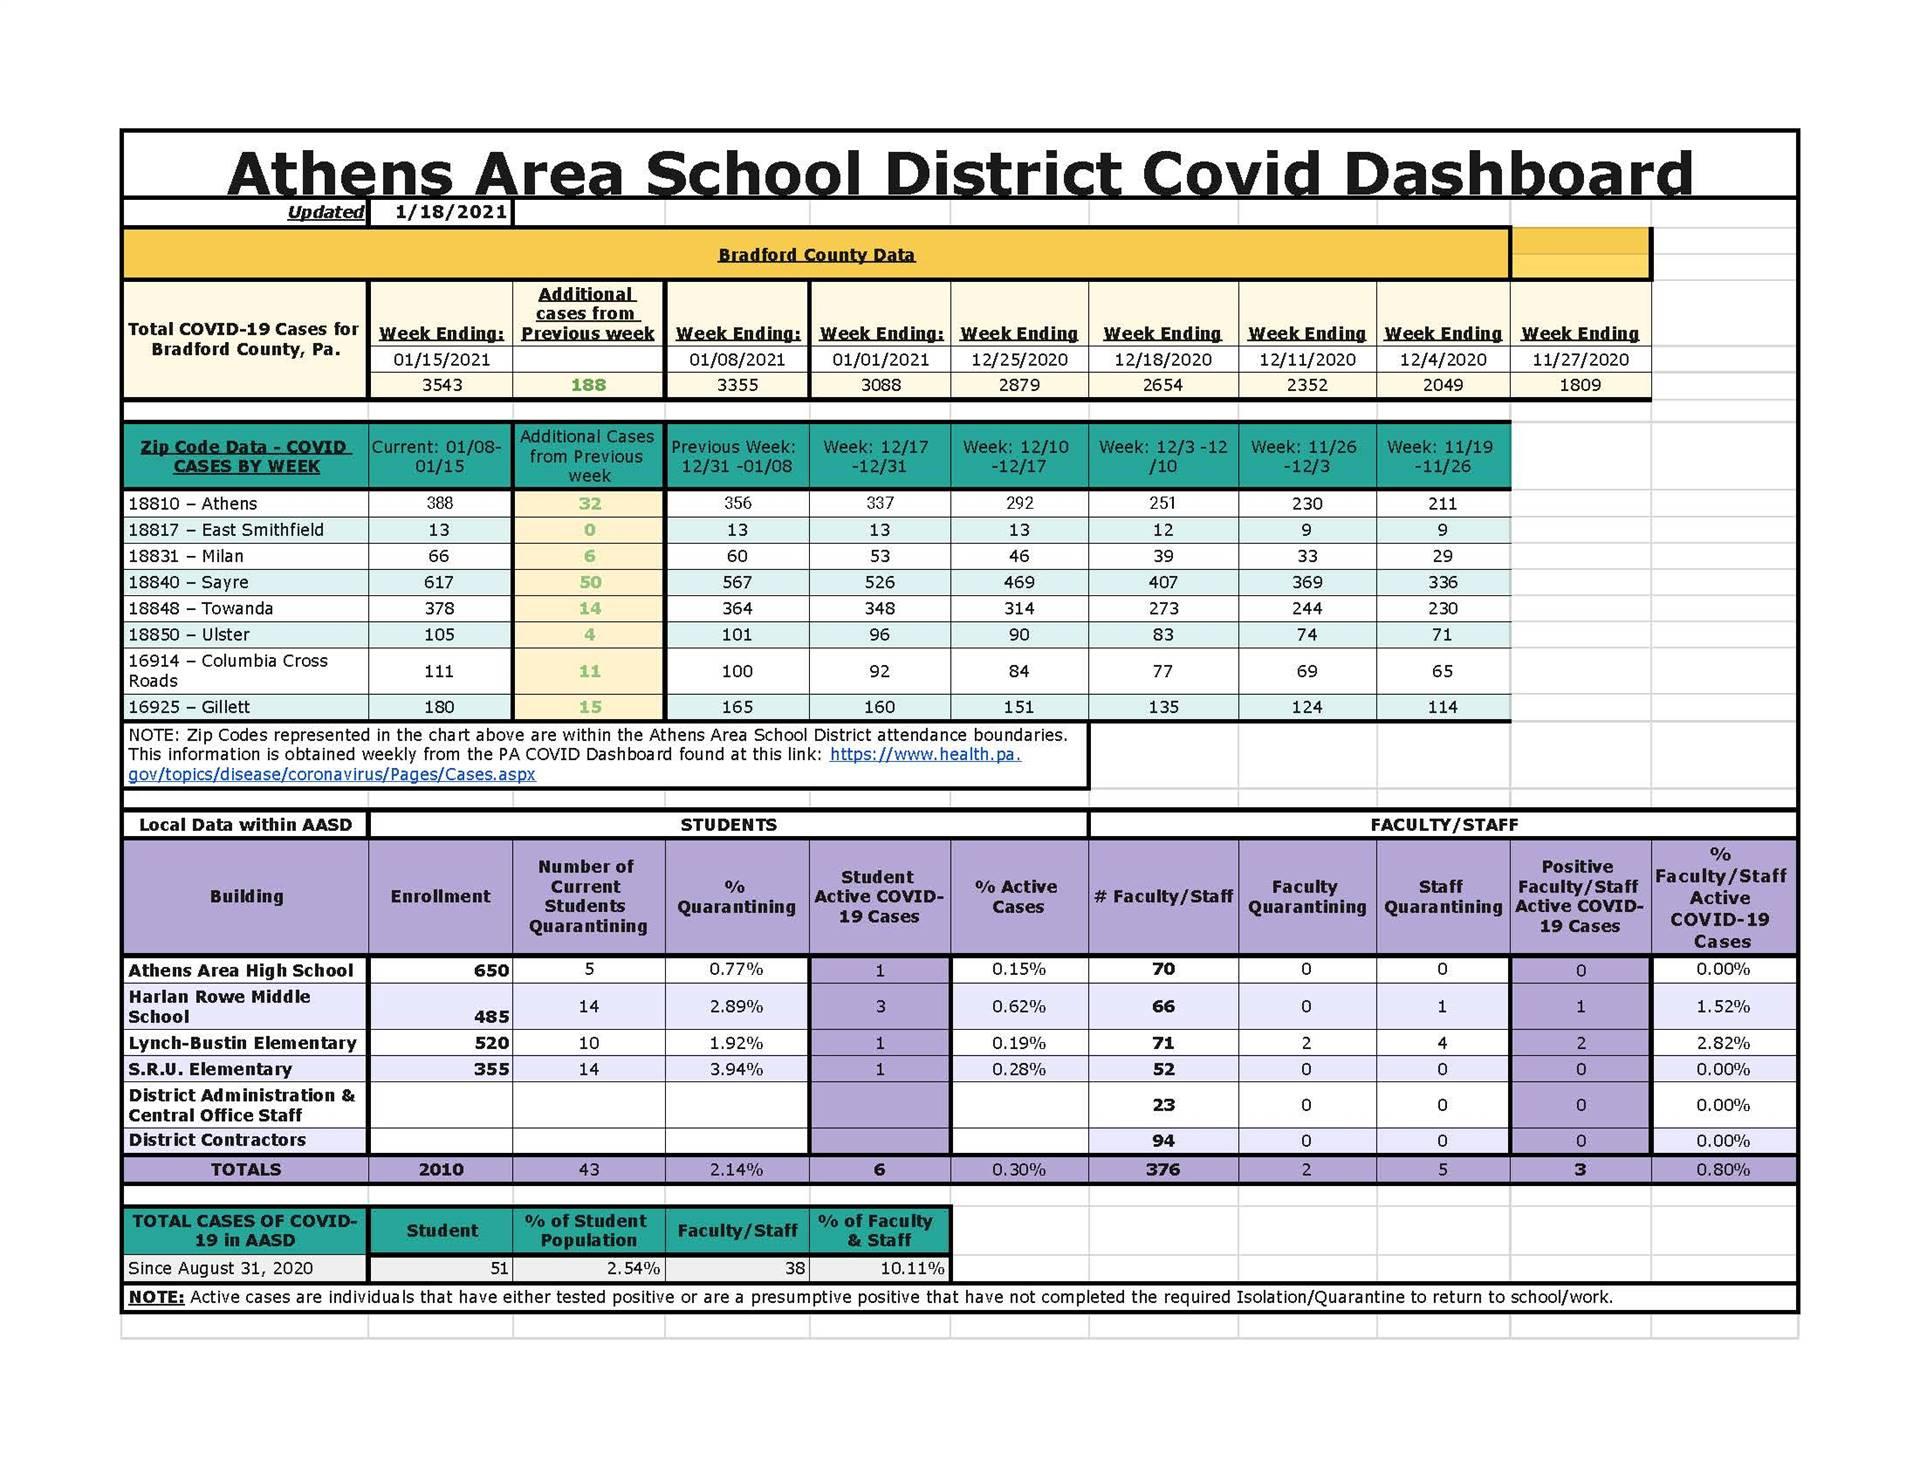 AASD COVID Dashboard 01.18.2021